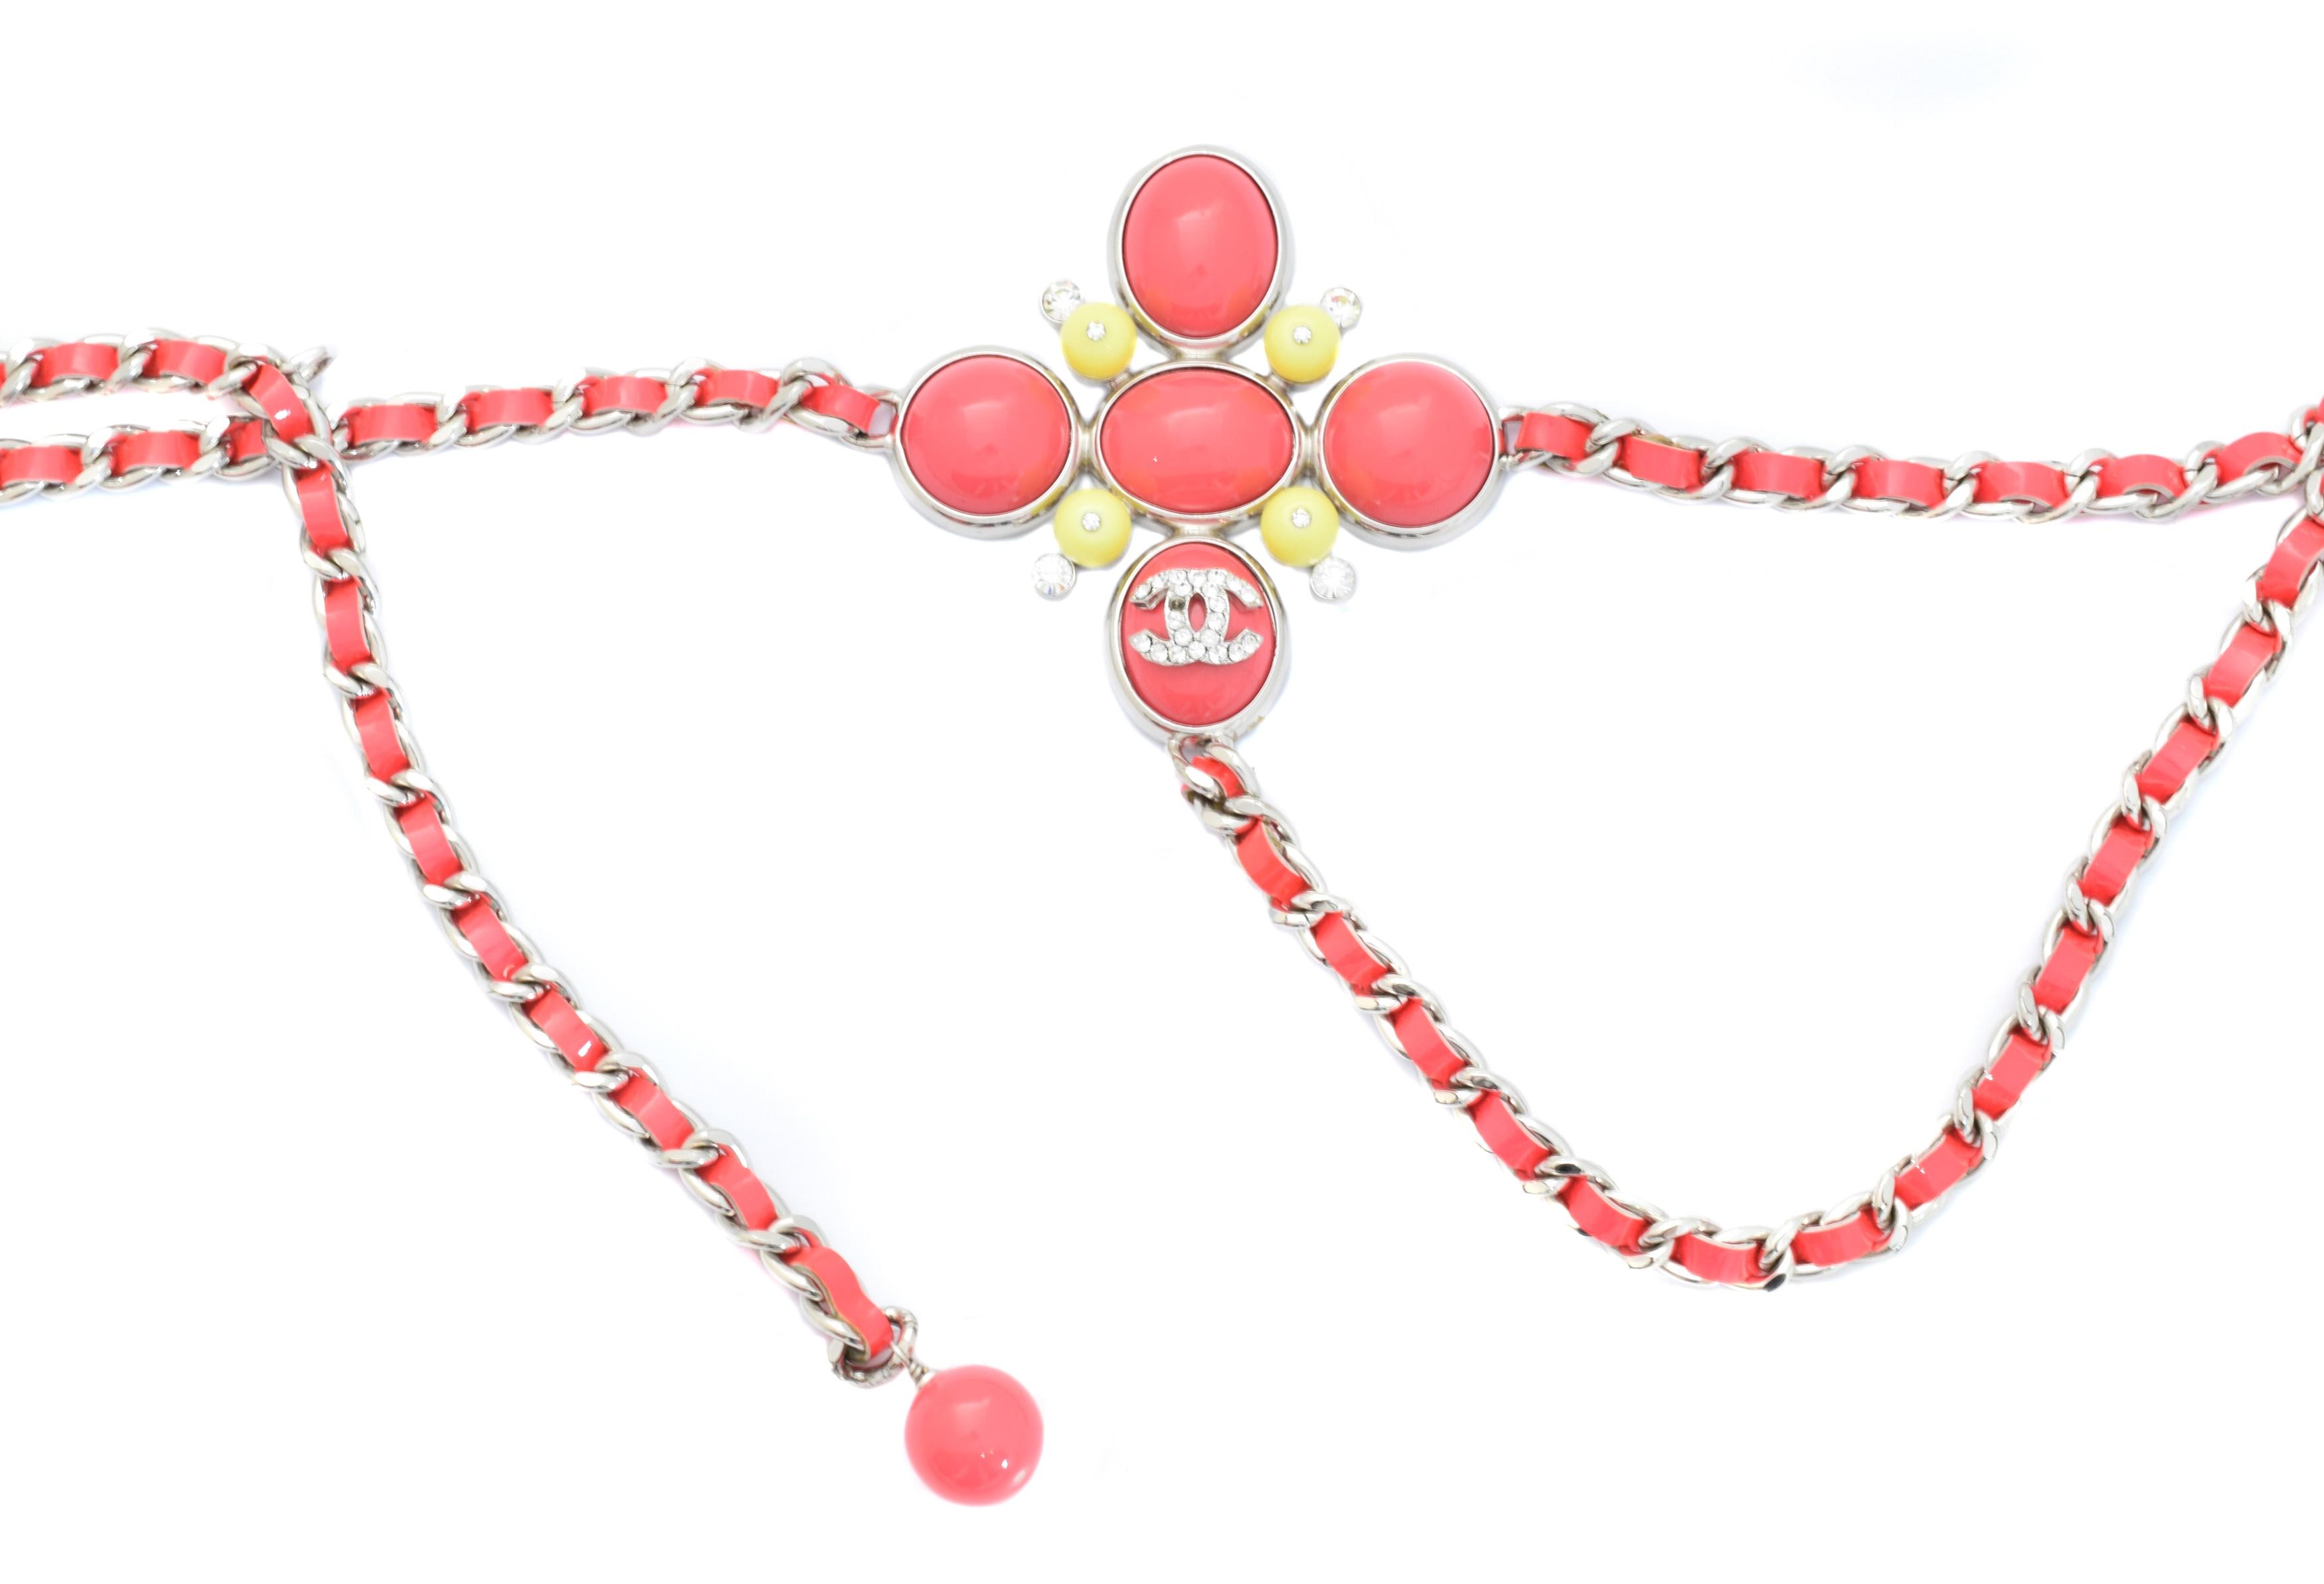 A Chanel belt,